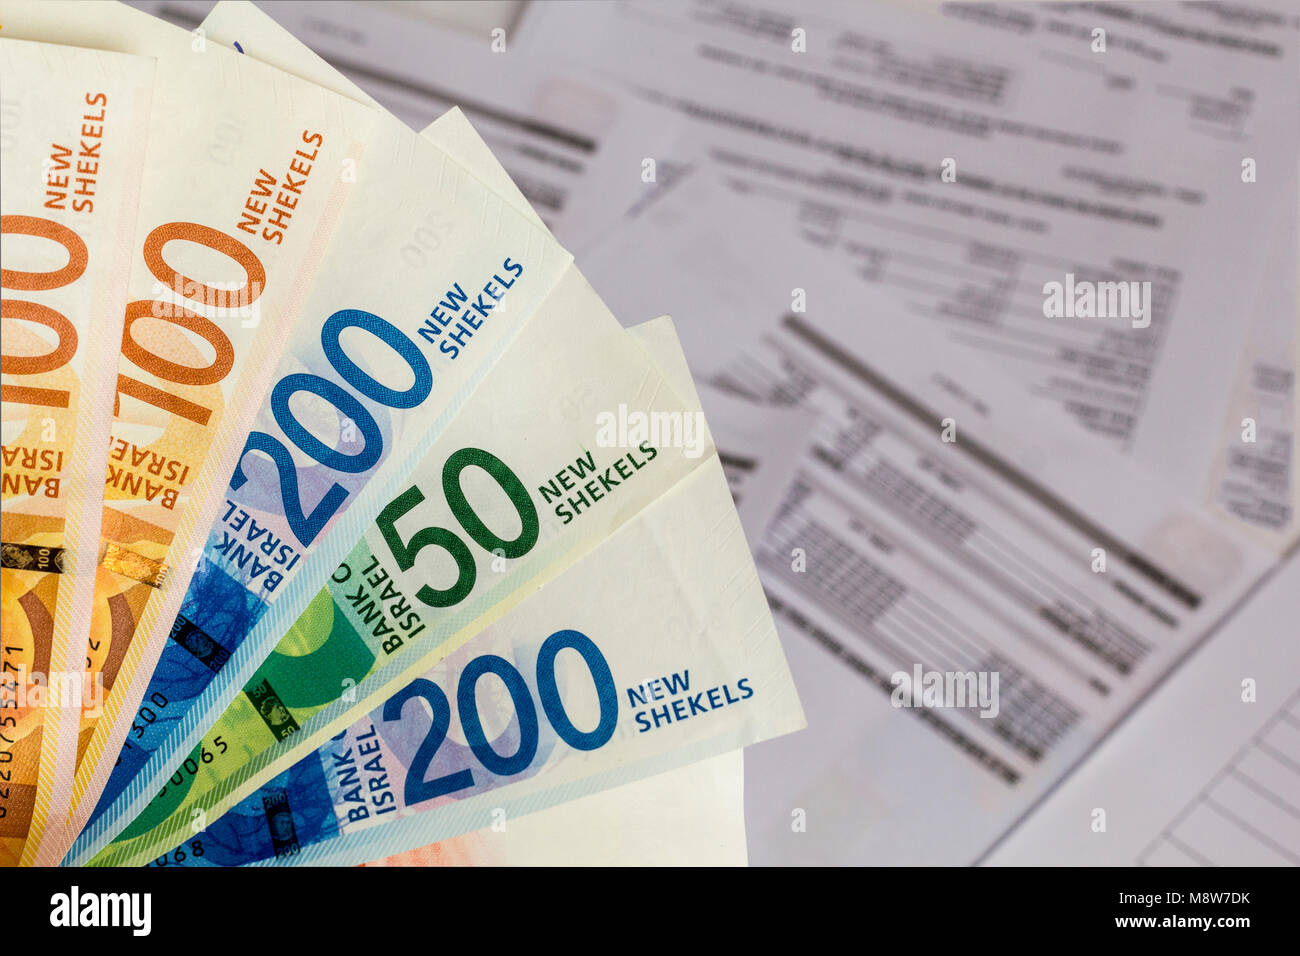 Twenty Shekels Israeli 20 New Sheqalim Bank of Israel 2017 years Paper Bill